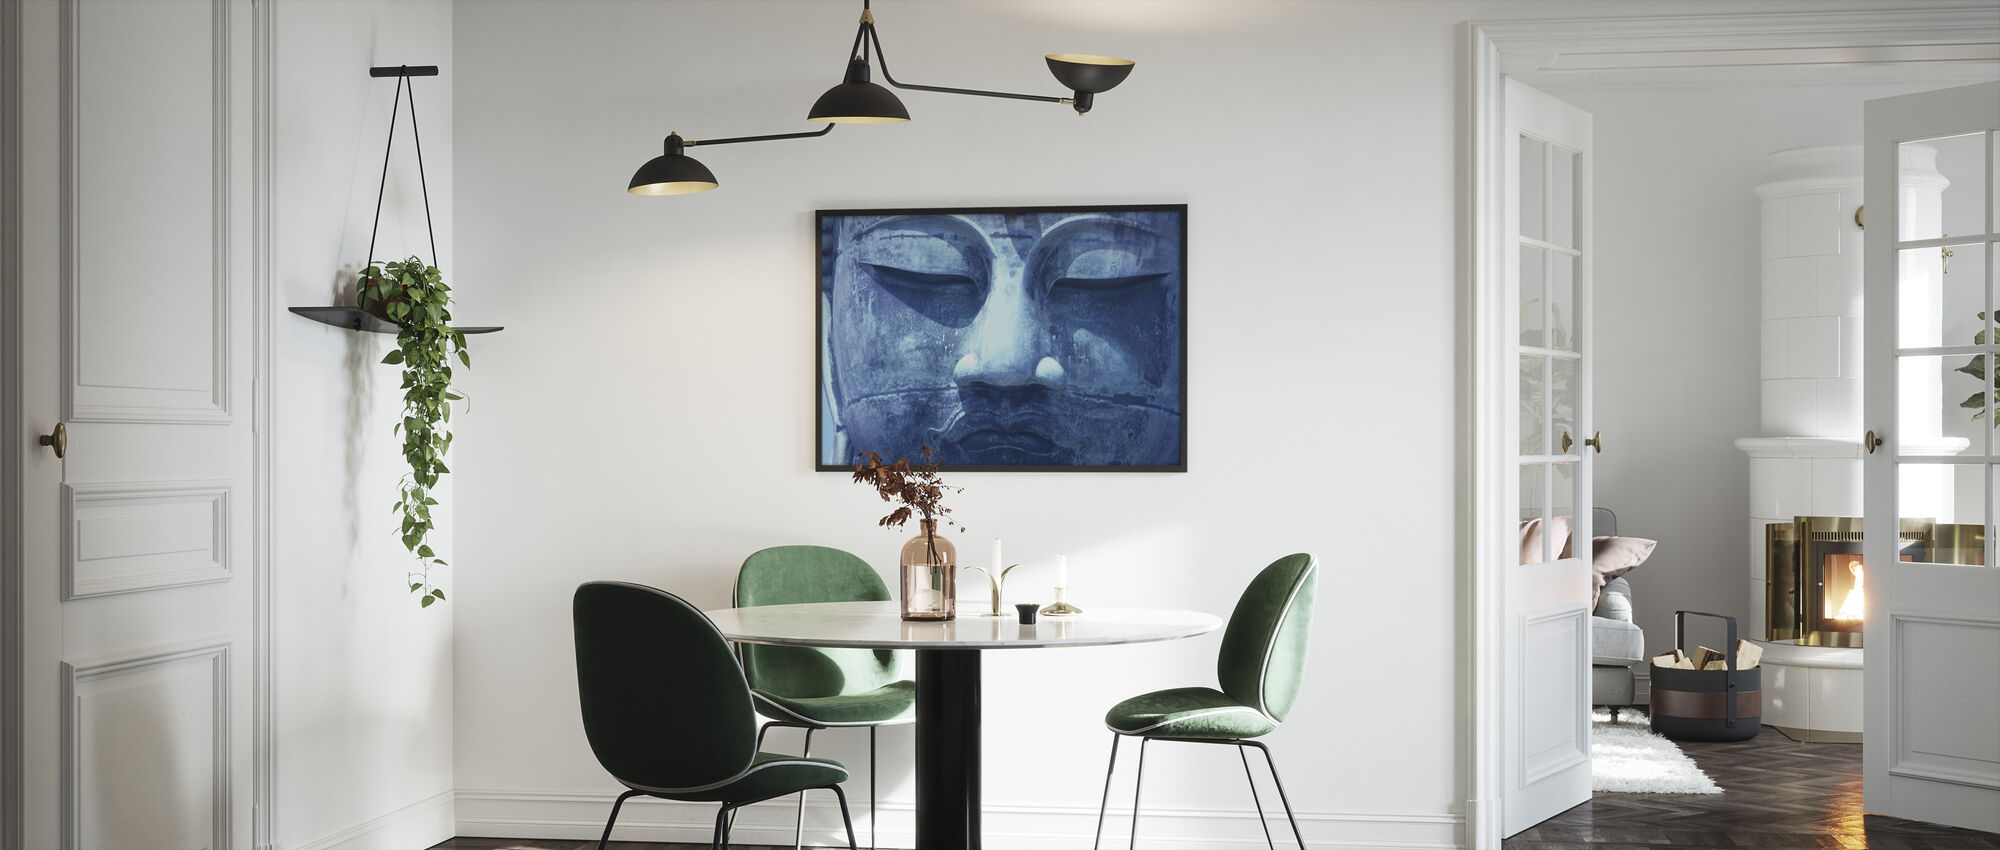 Blauwe Boeddha - Ingelijste print - Keuken